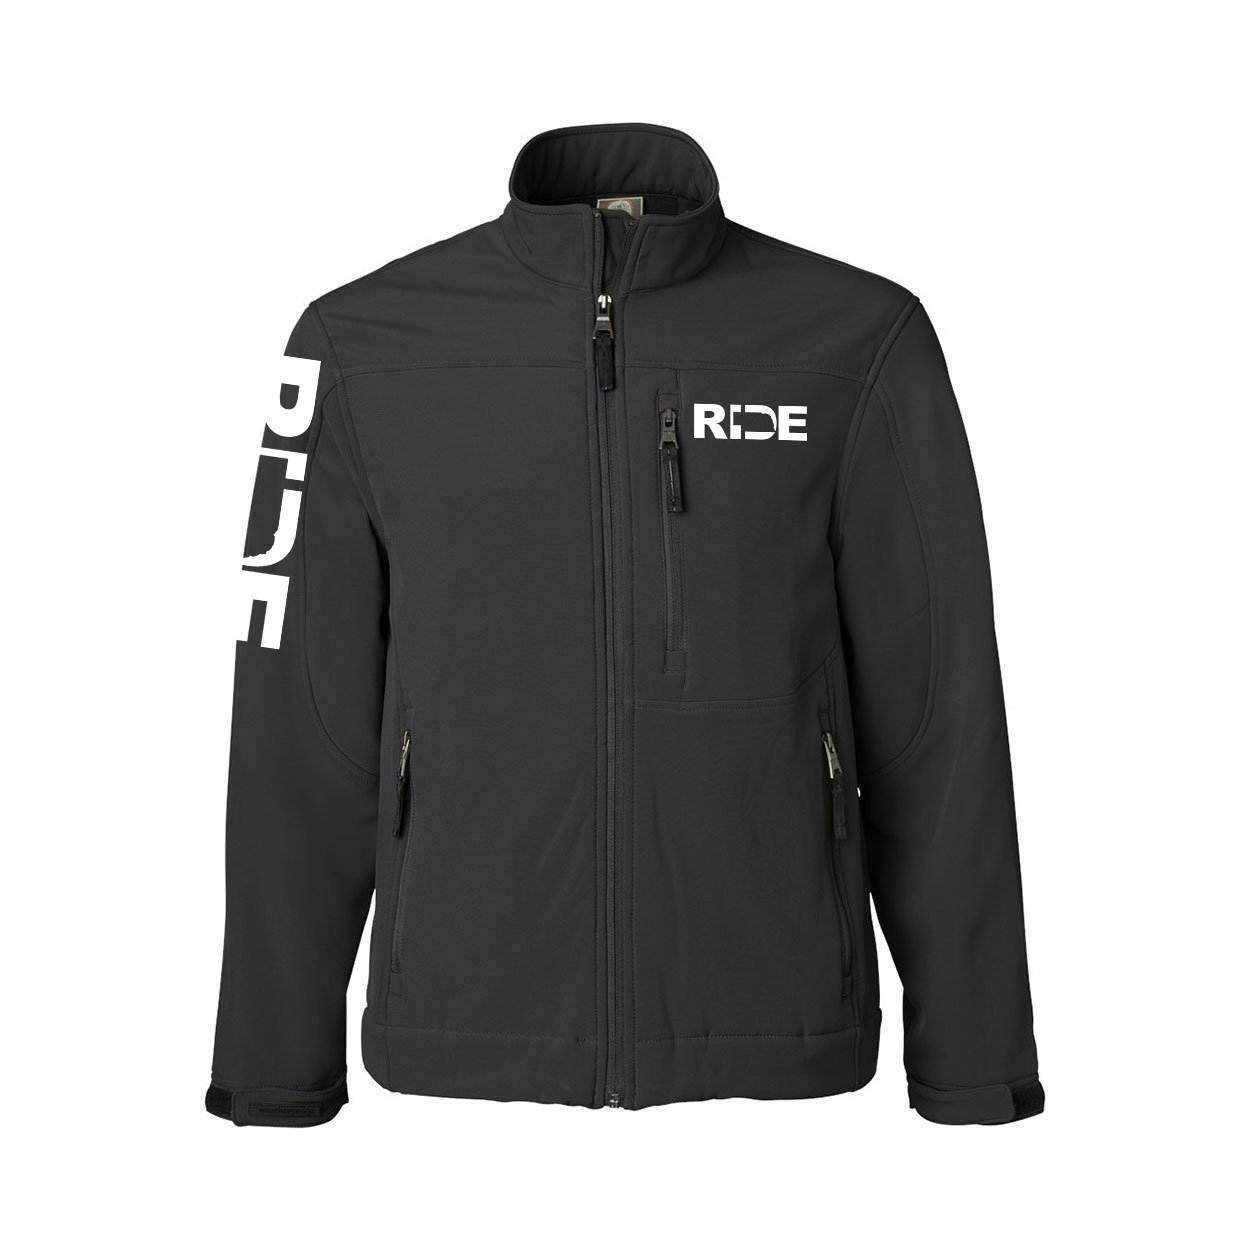 Ride Nebraska Classic Soft Shell Weatherproof Jacket (White Logo)